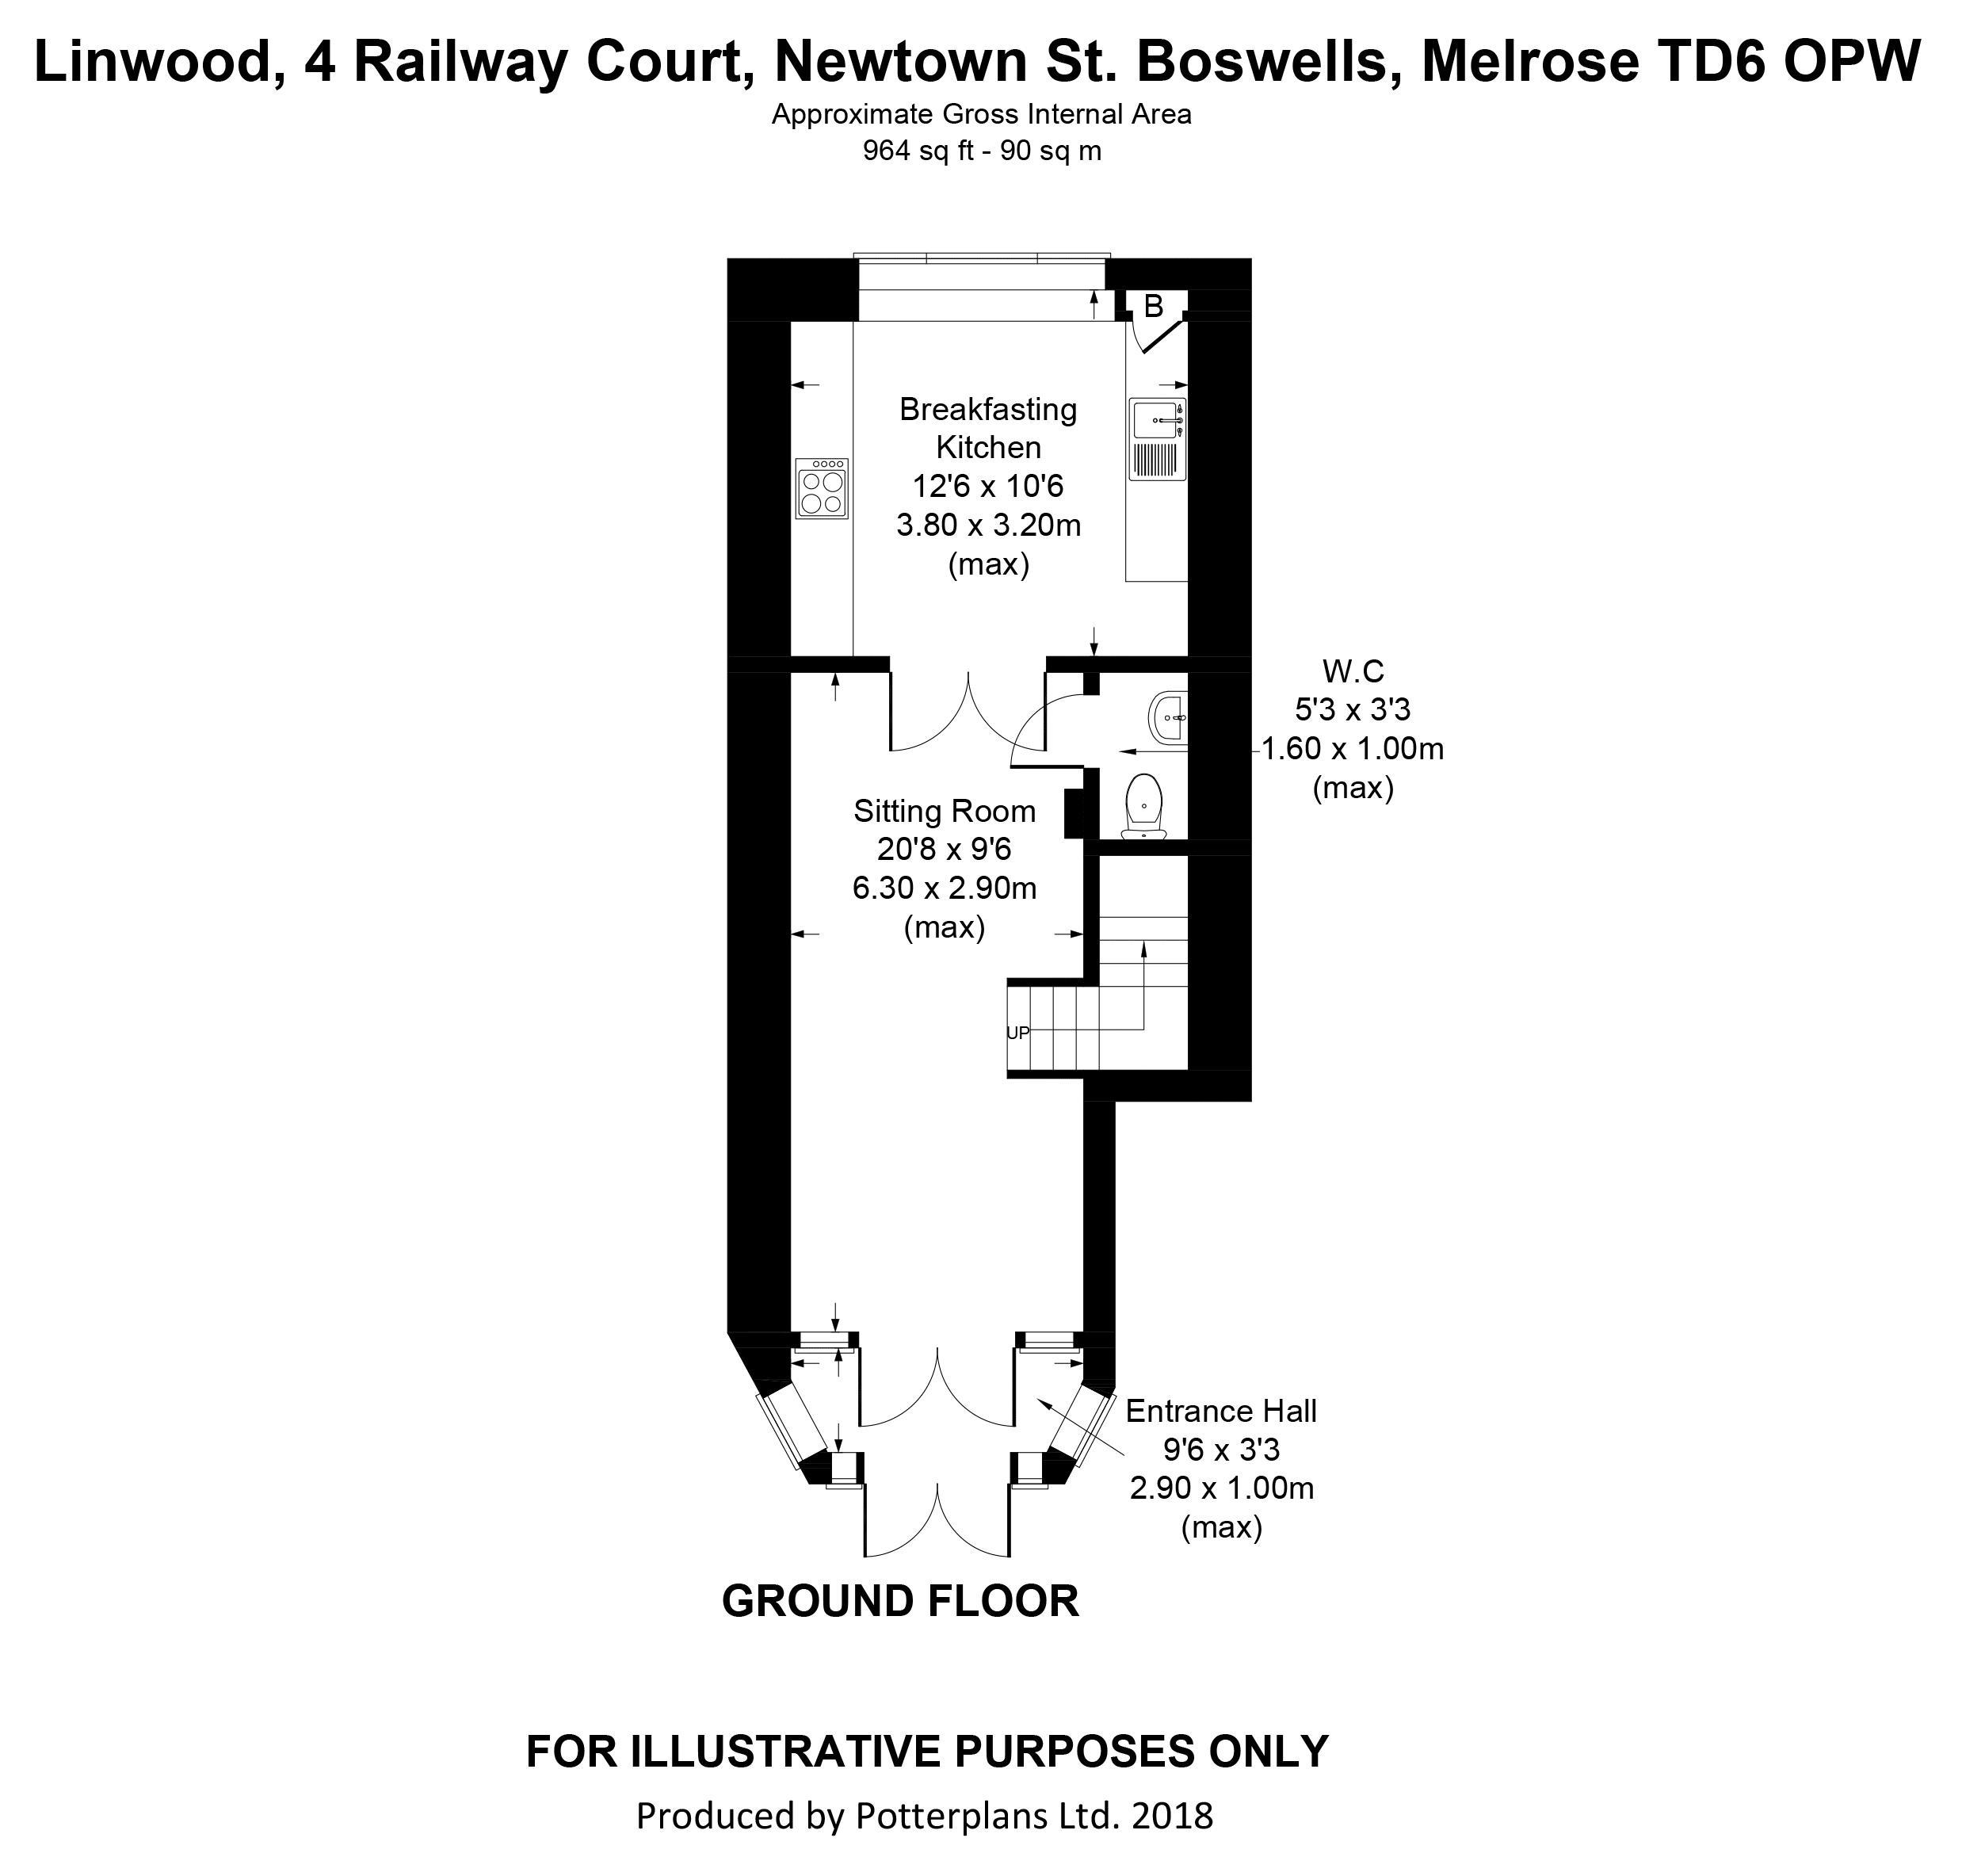 Linwood Ground Floor